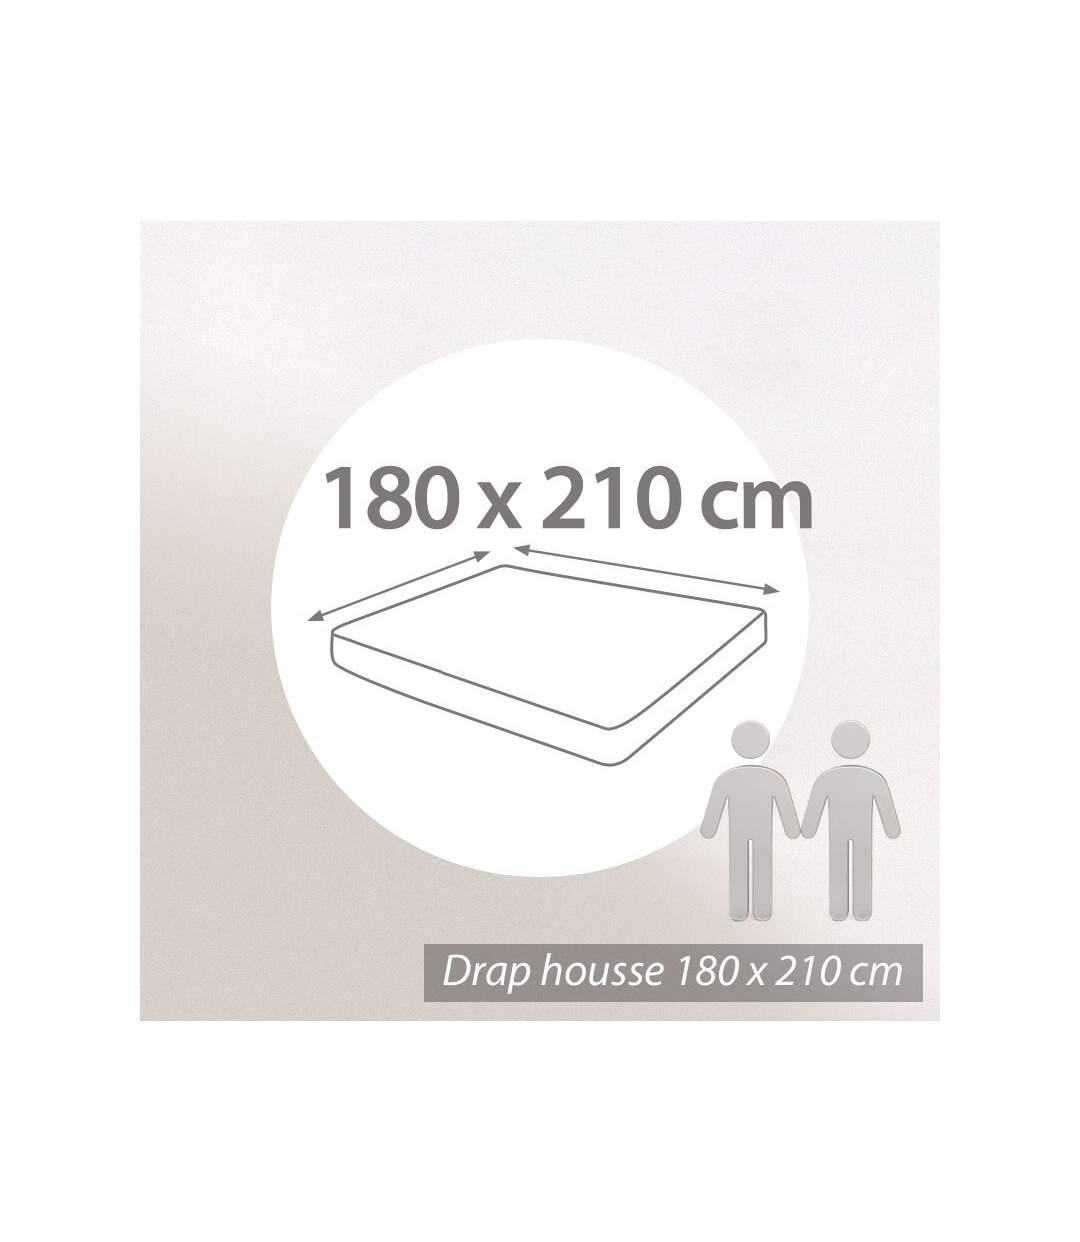 Protège matelas absorbant Antonin blanc 180x210 Grand Bonnet 40cm